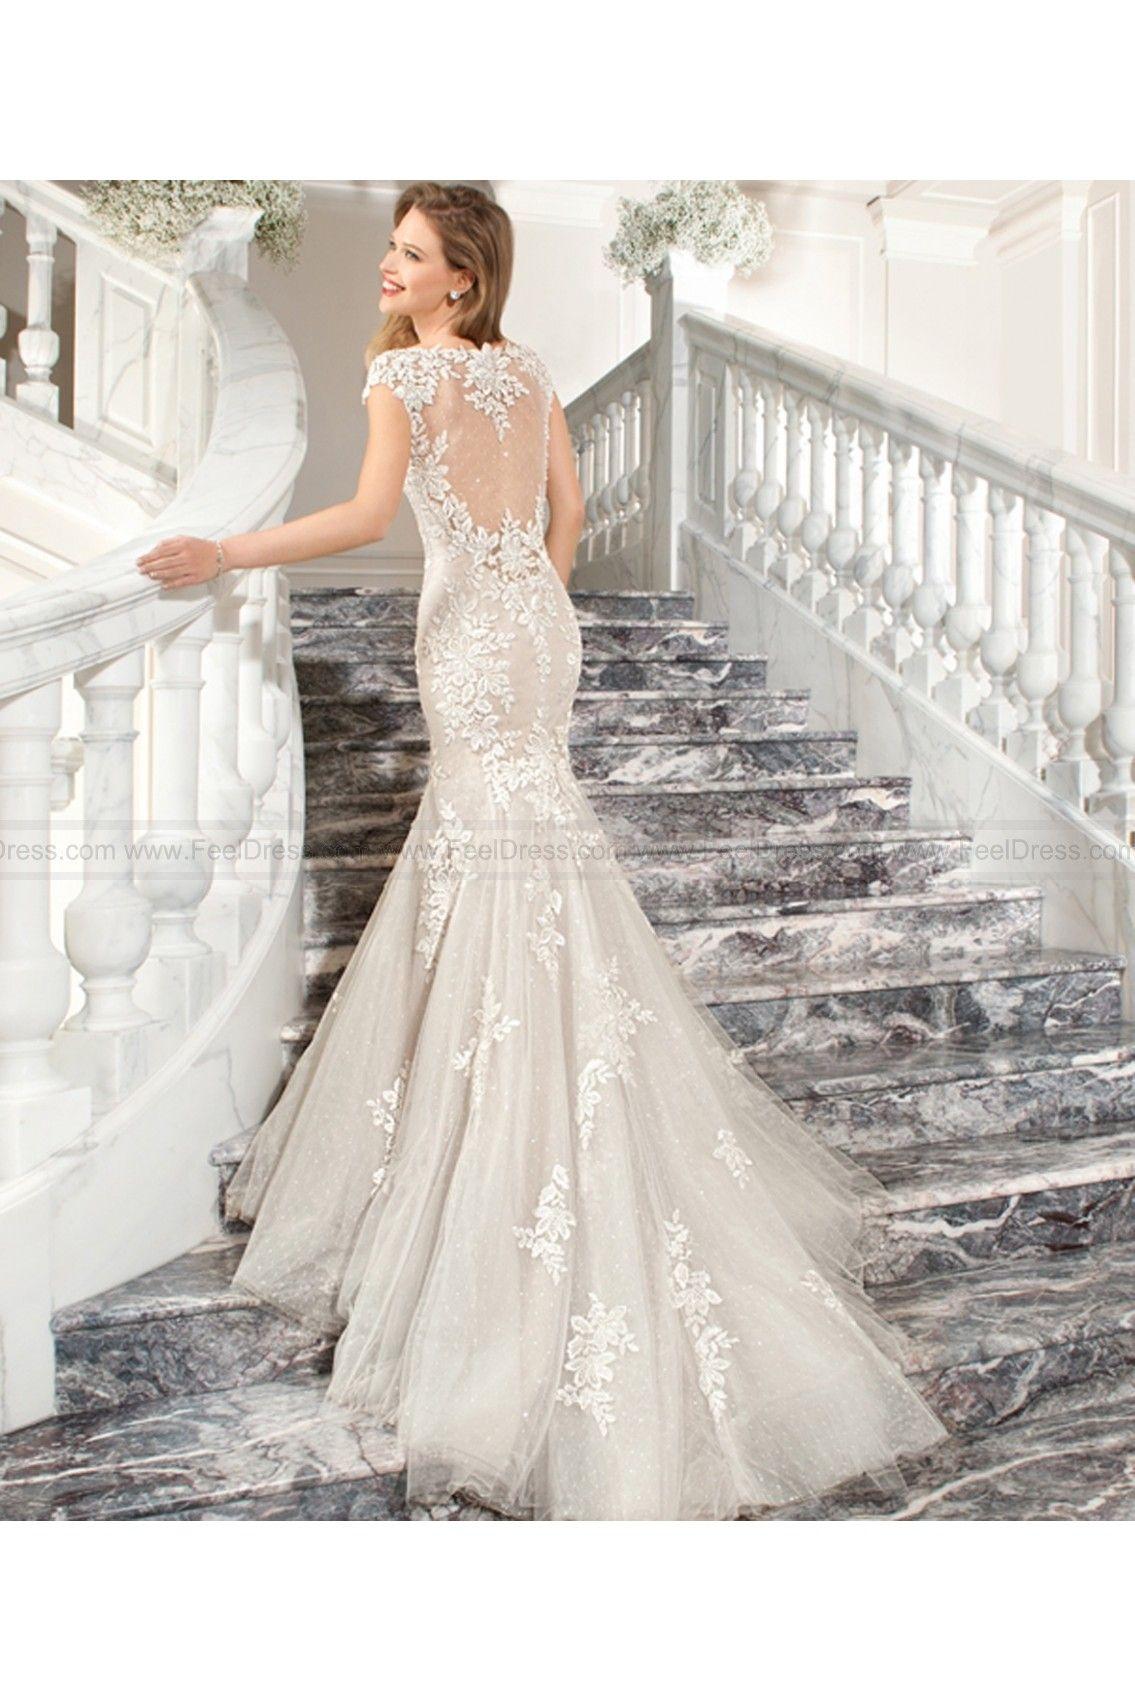 20 Demetrios Wedding Dresses ideas   wedding dresses, demetrios ...